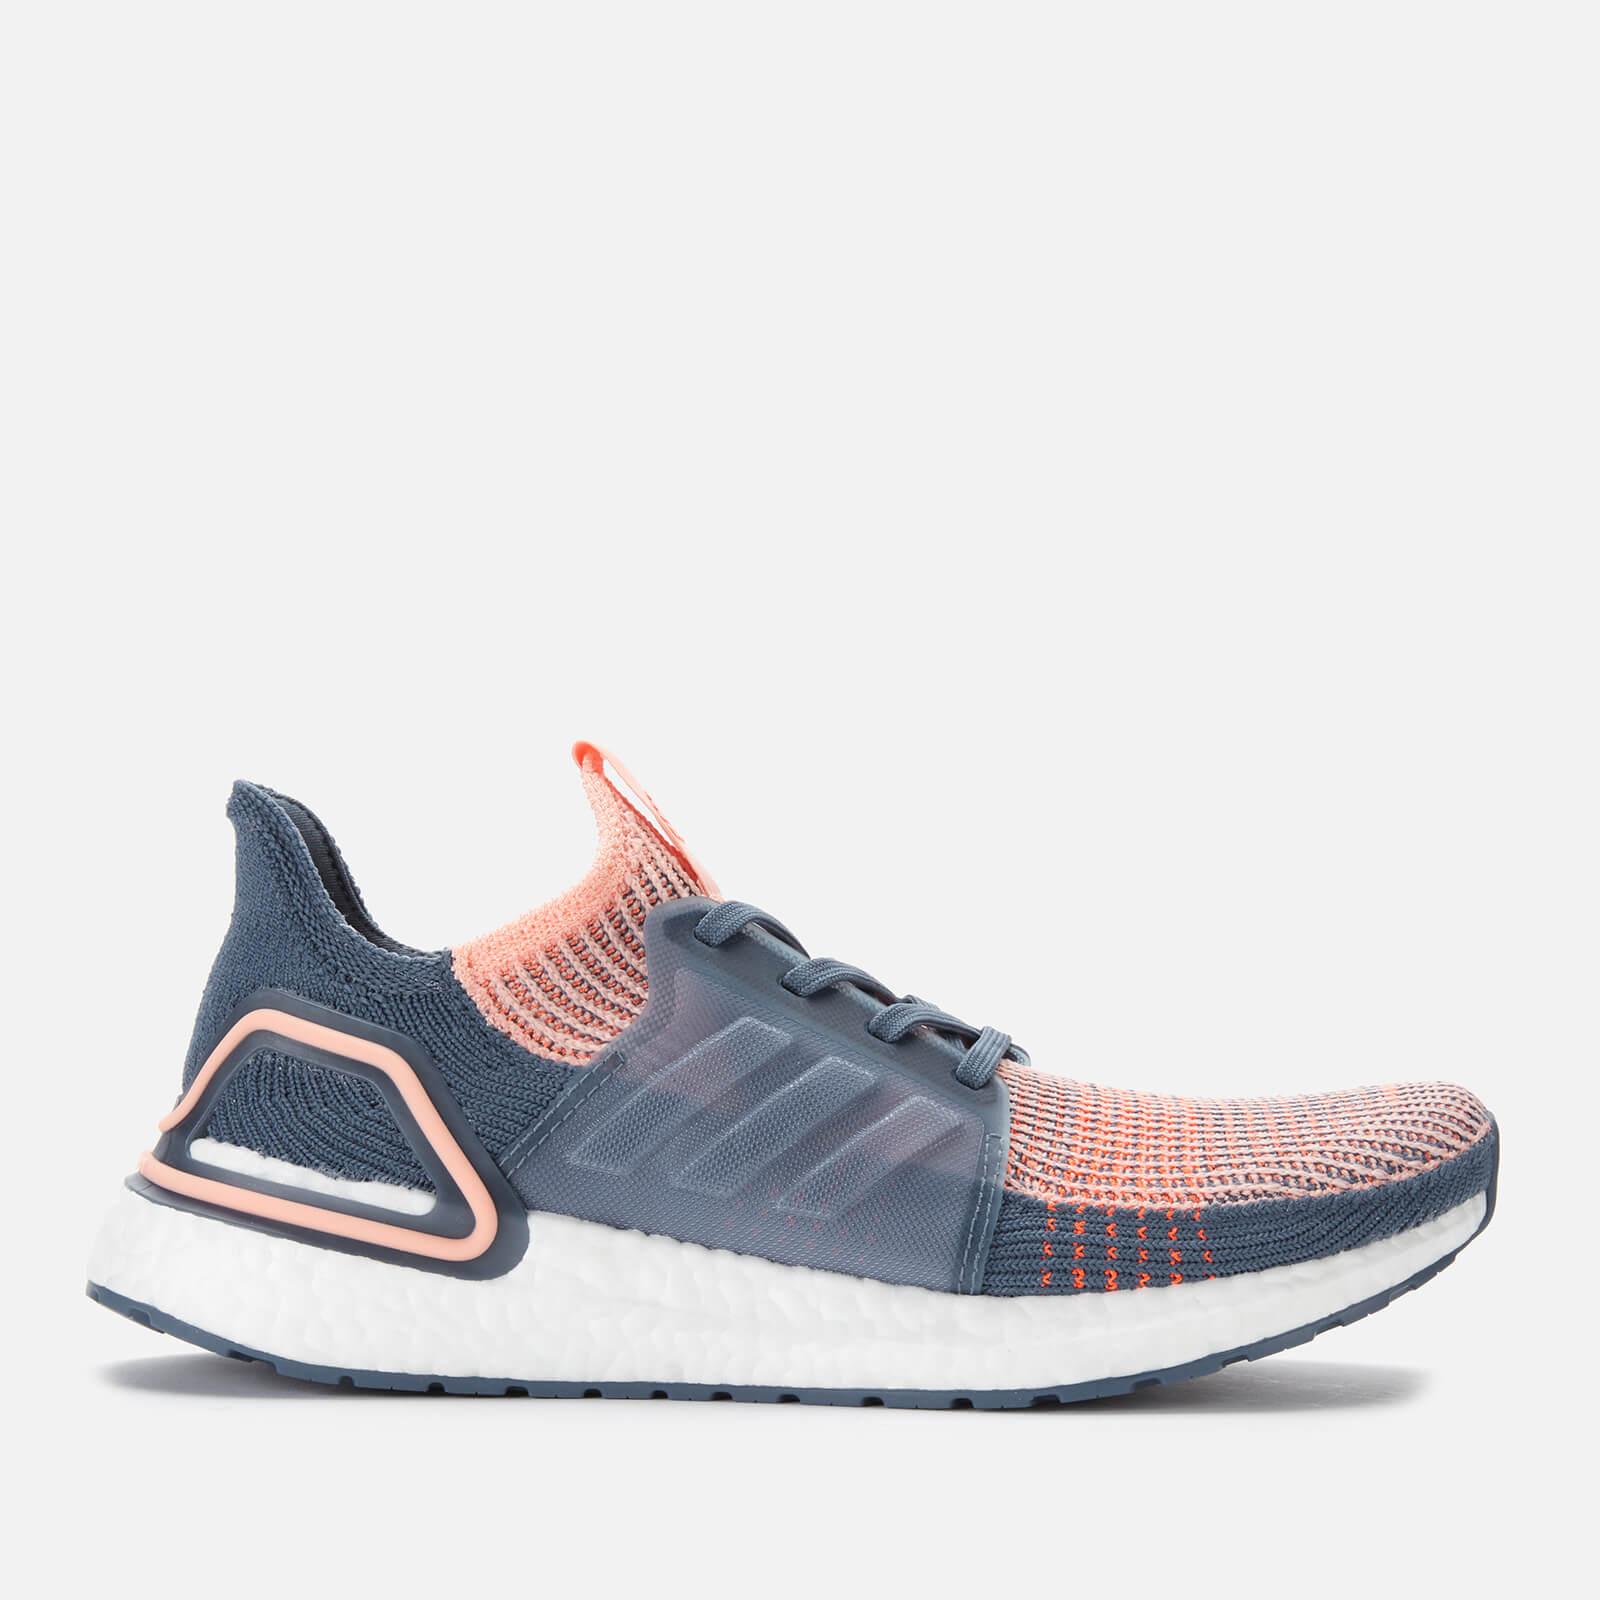 adidas Women's Ultraboost 19 Trainers - Pink/Blue - UK 8 - Multi